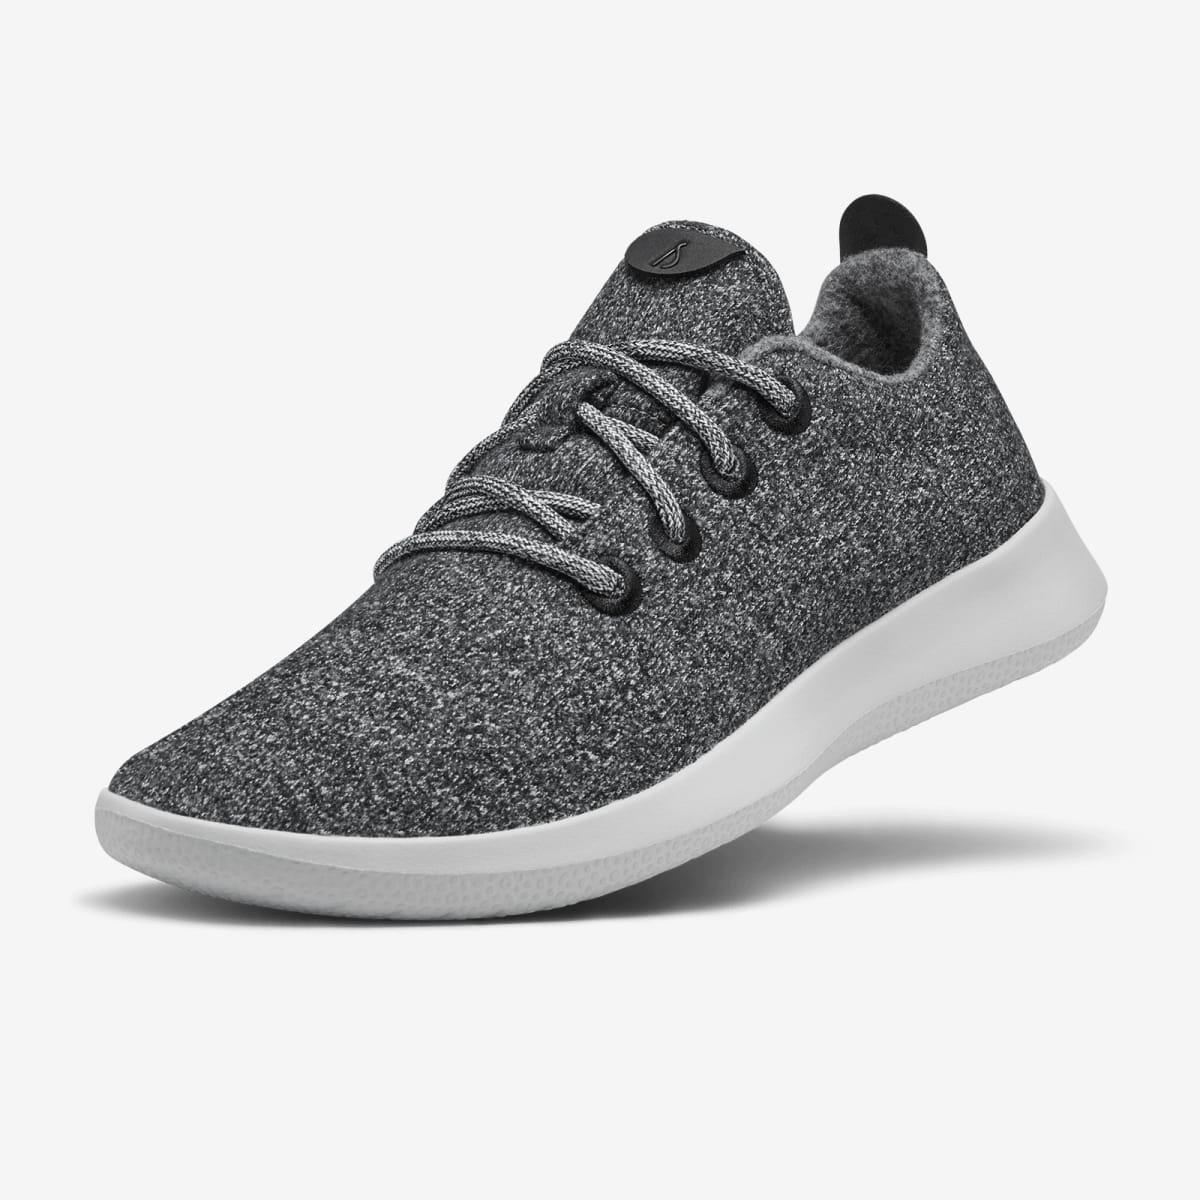 Men's Wool Runners - Natural Grey (Light Grey Sole)